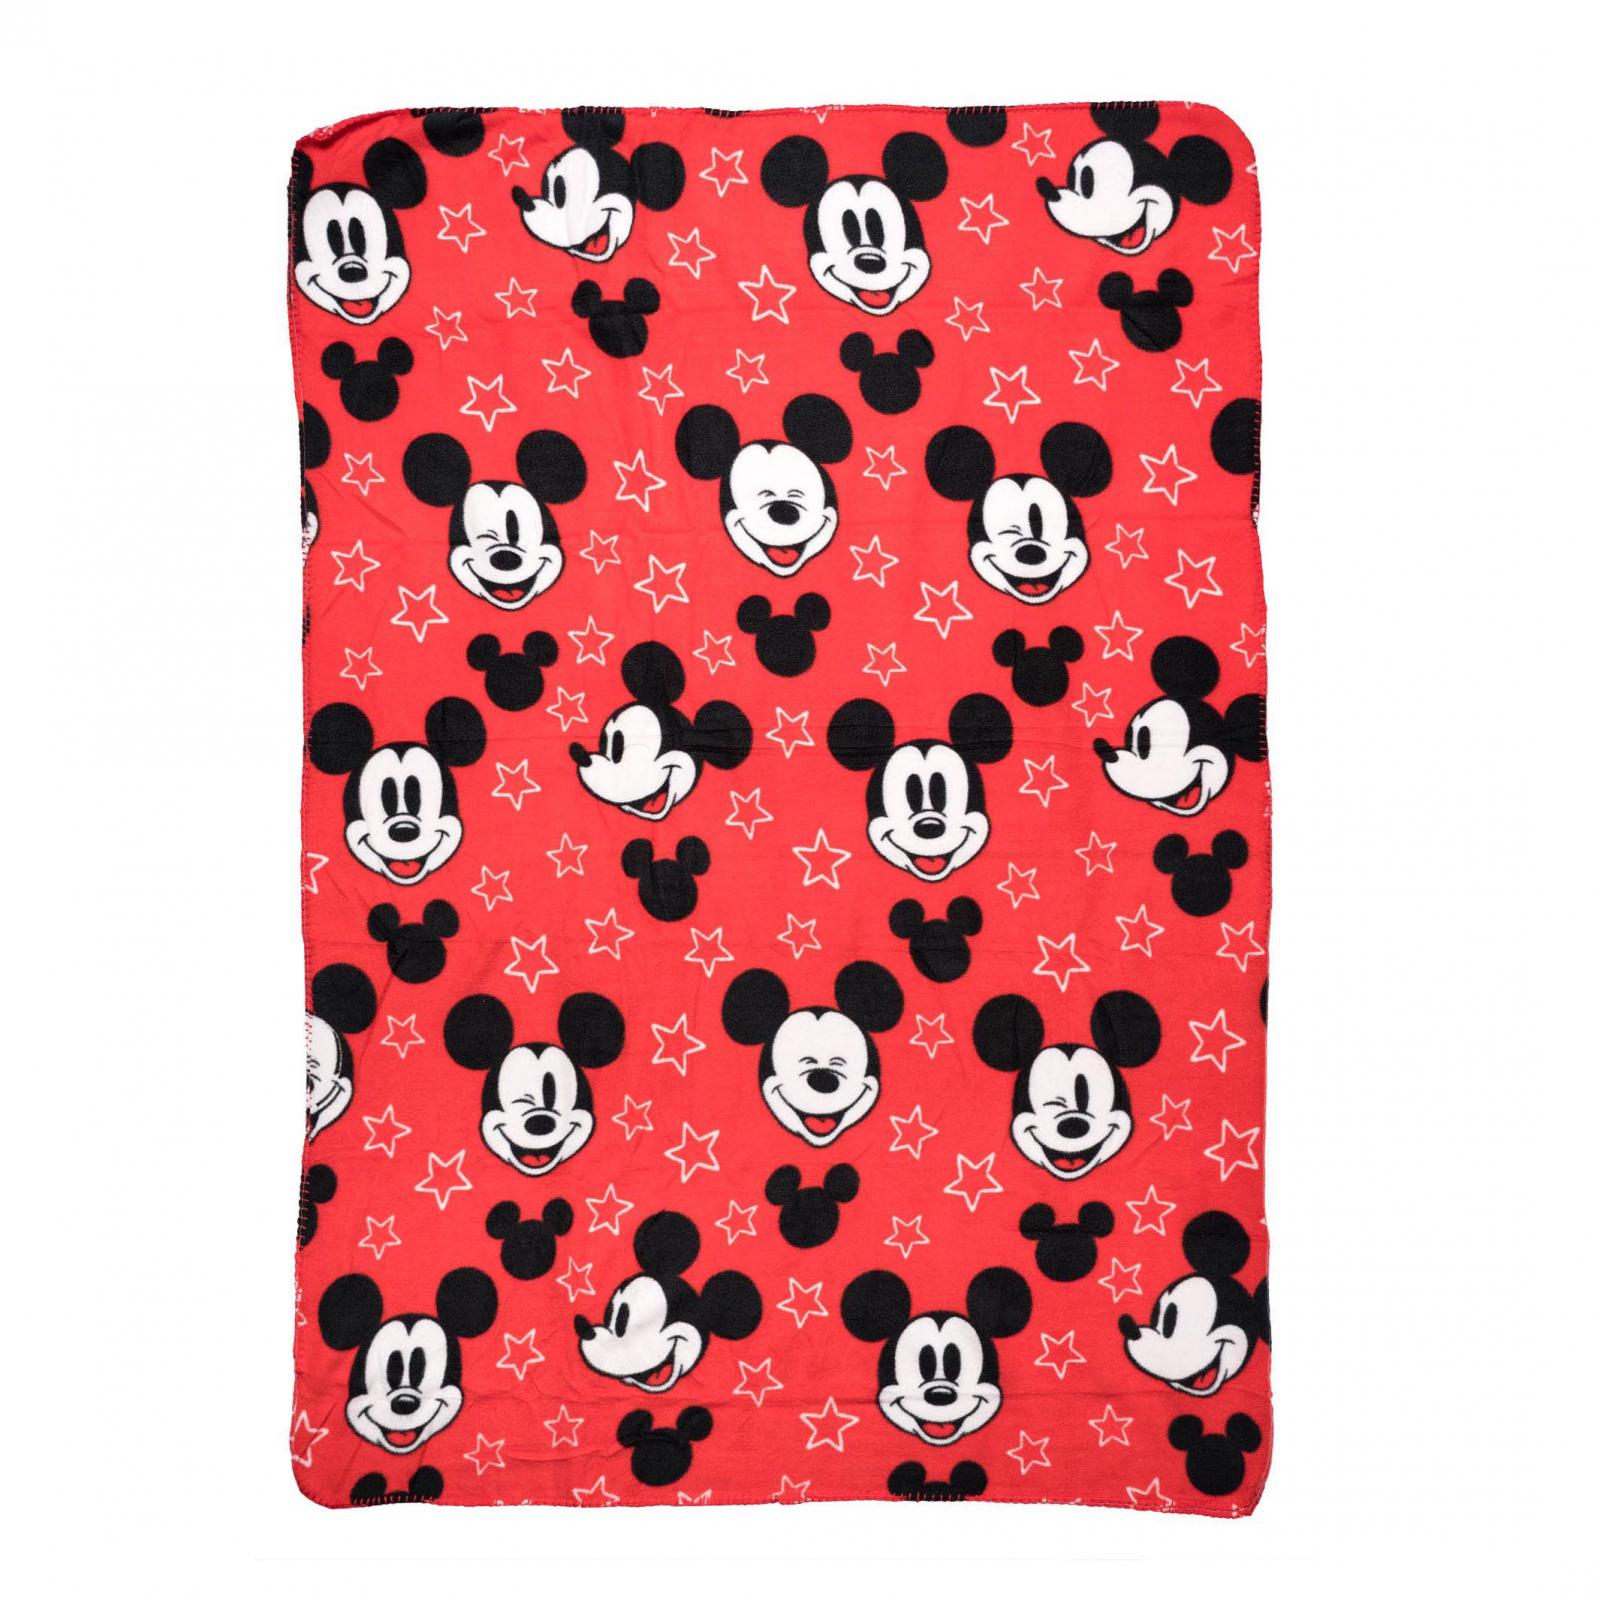 Disney Mickey Mouse Plush Fleece Throw Blanket 45 x 60 Inch